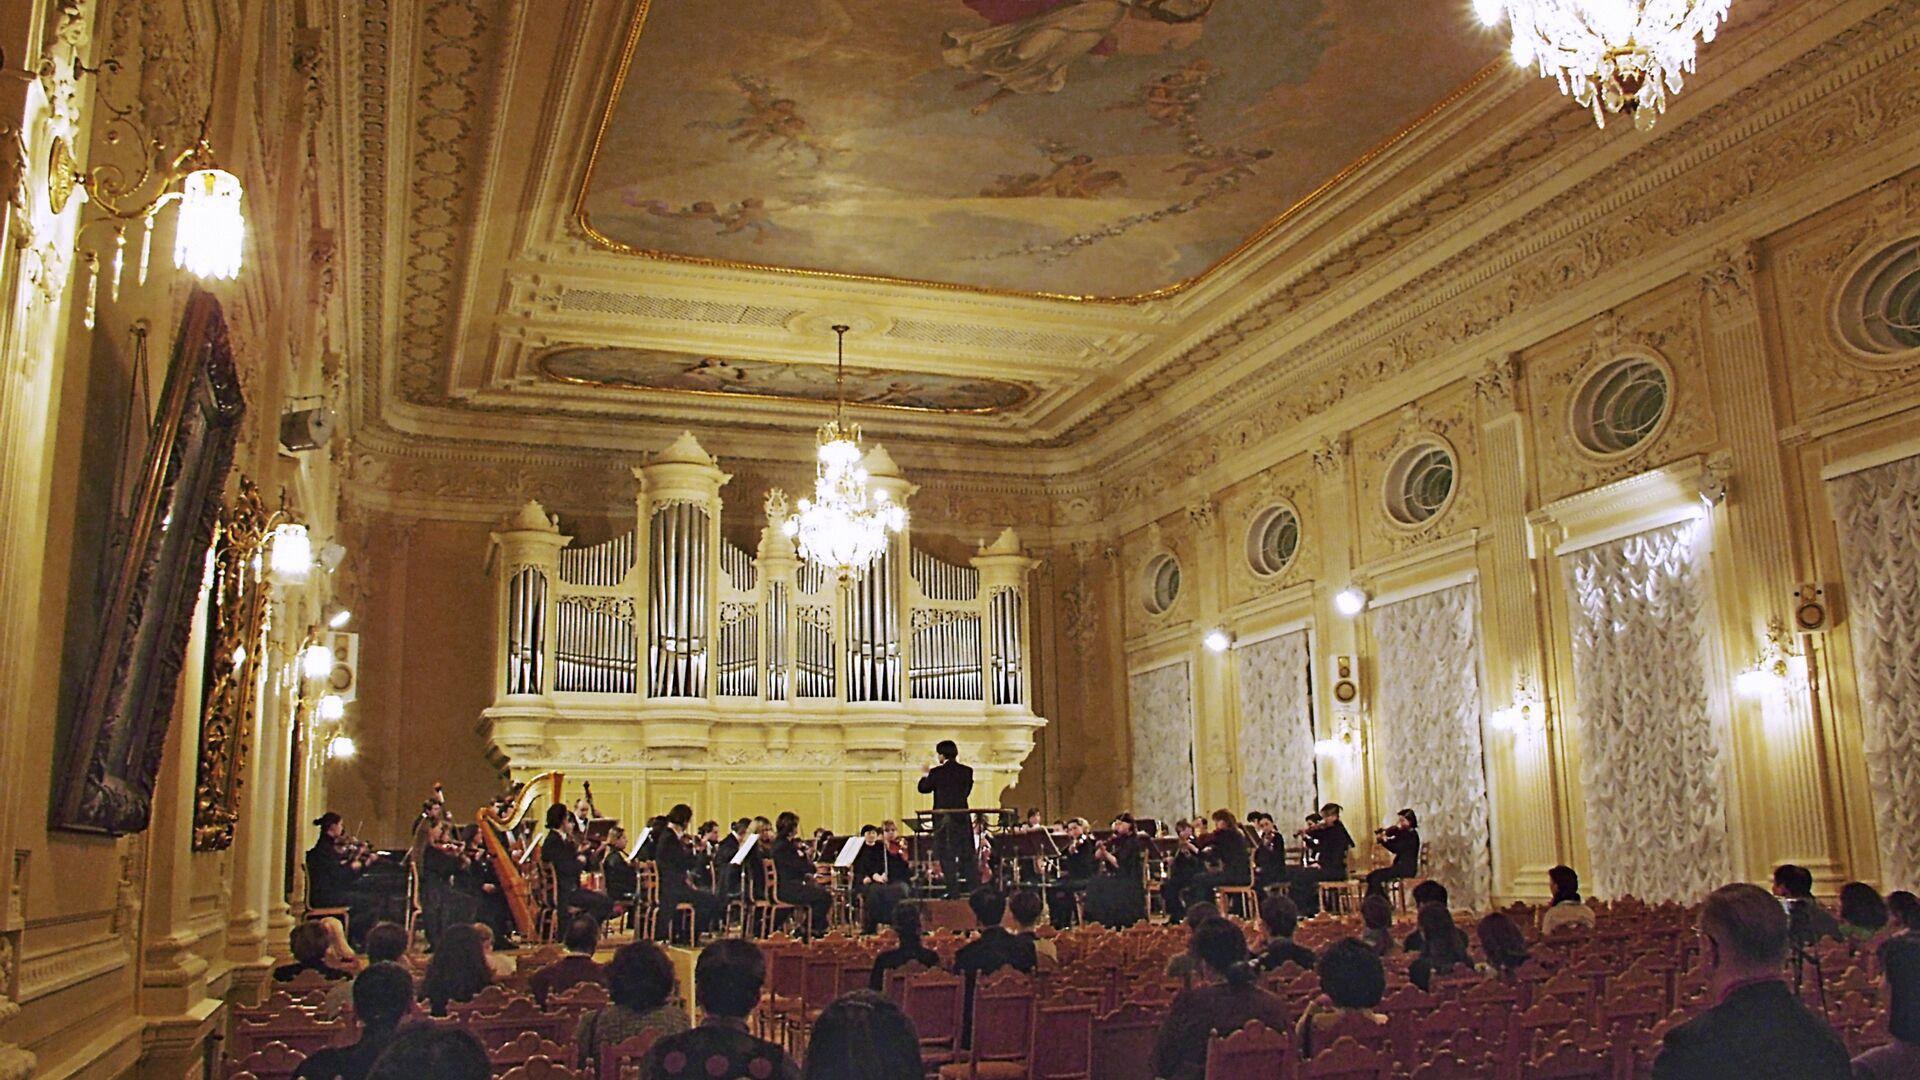 Зал в консерватории в Санкт-Петербурге - РИА Новости, 1920, 10.11.2020